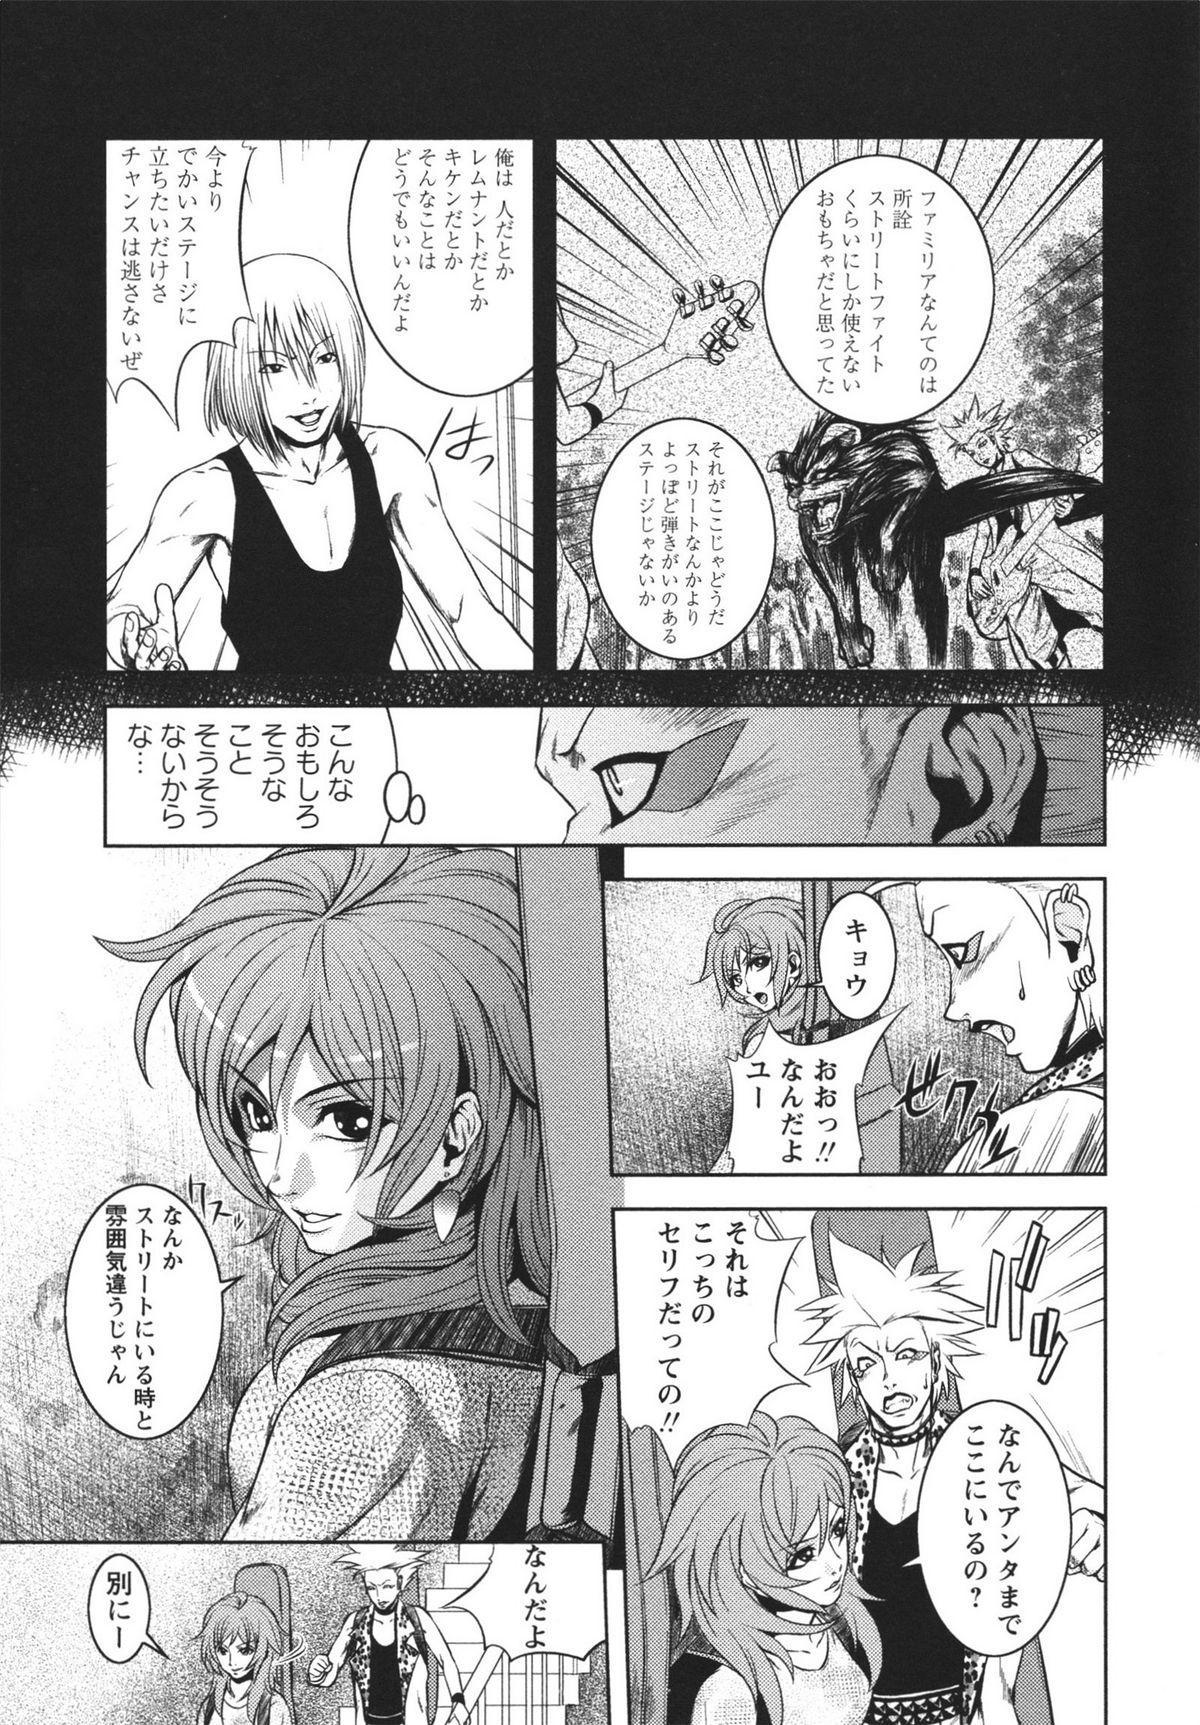 [Kawazuko Chouji] m7 -Minor Seven- Jou 124